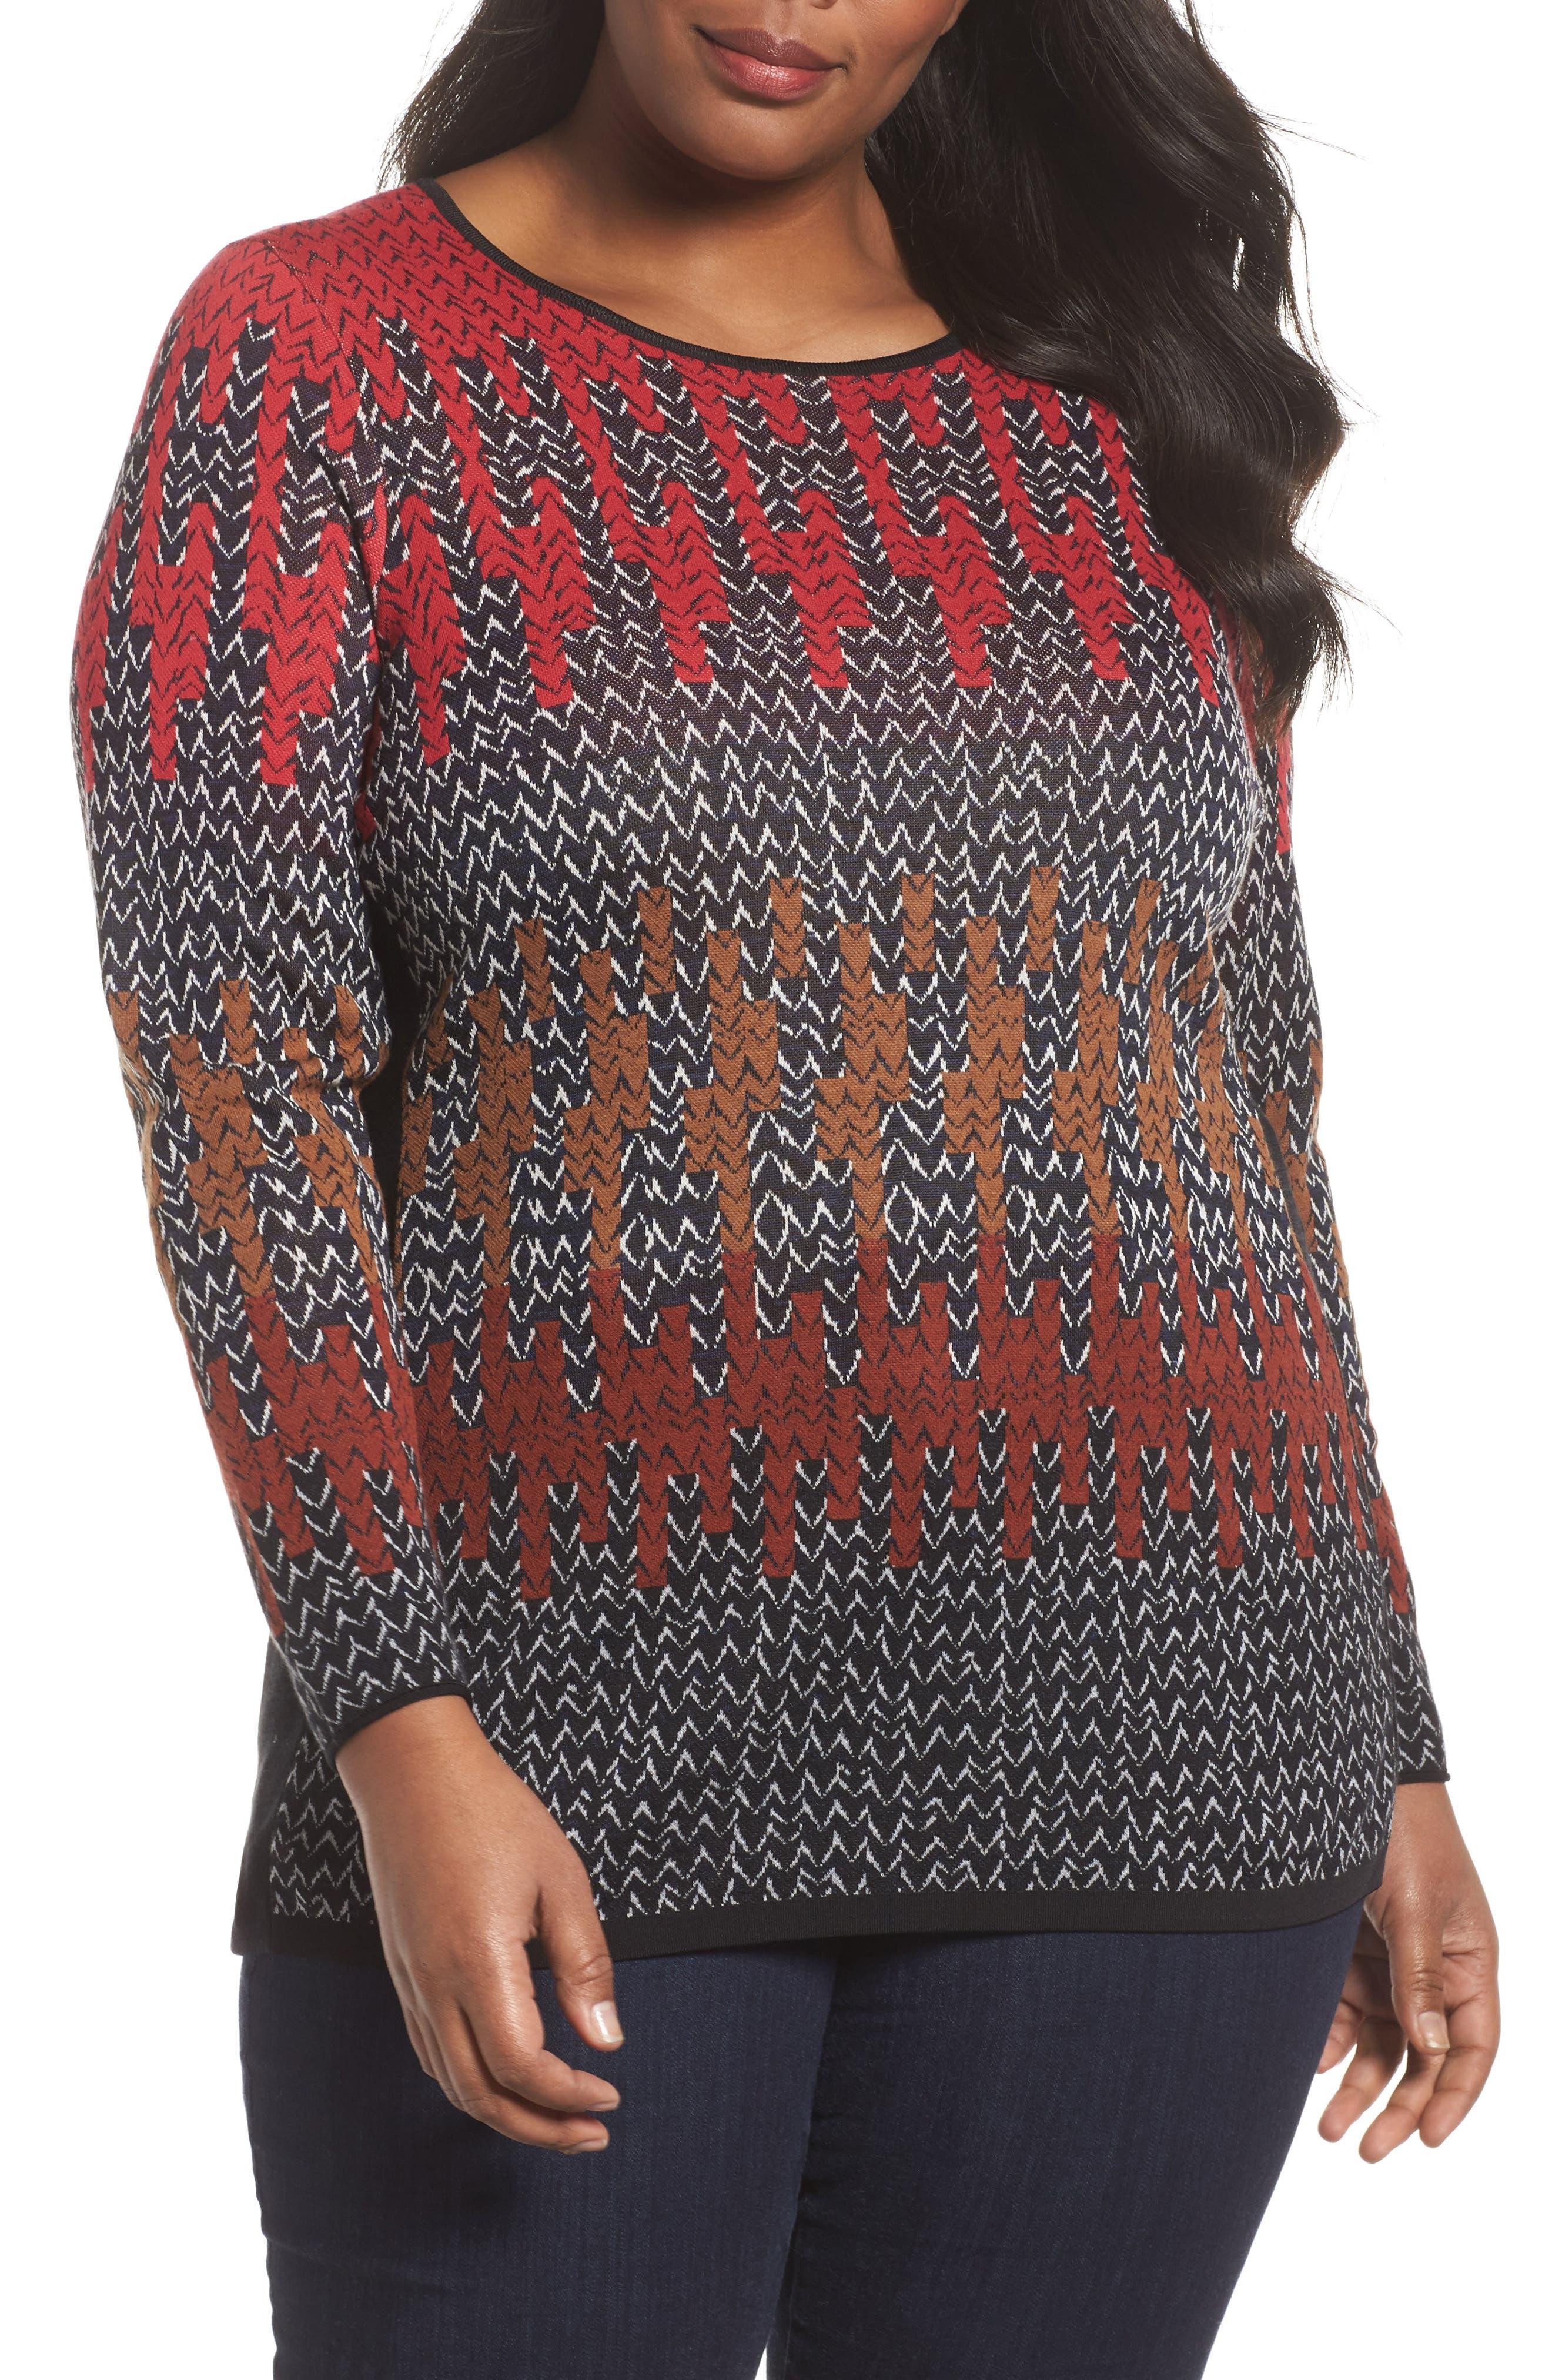 Sunset Sweater,                             Main thumbnail 1, color,                             Multi